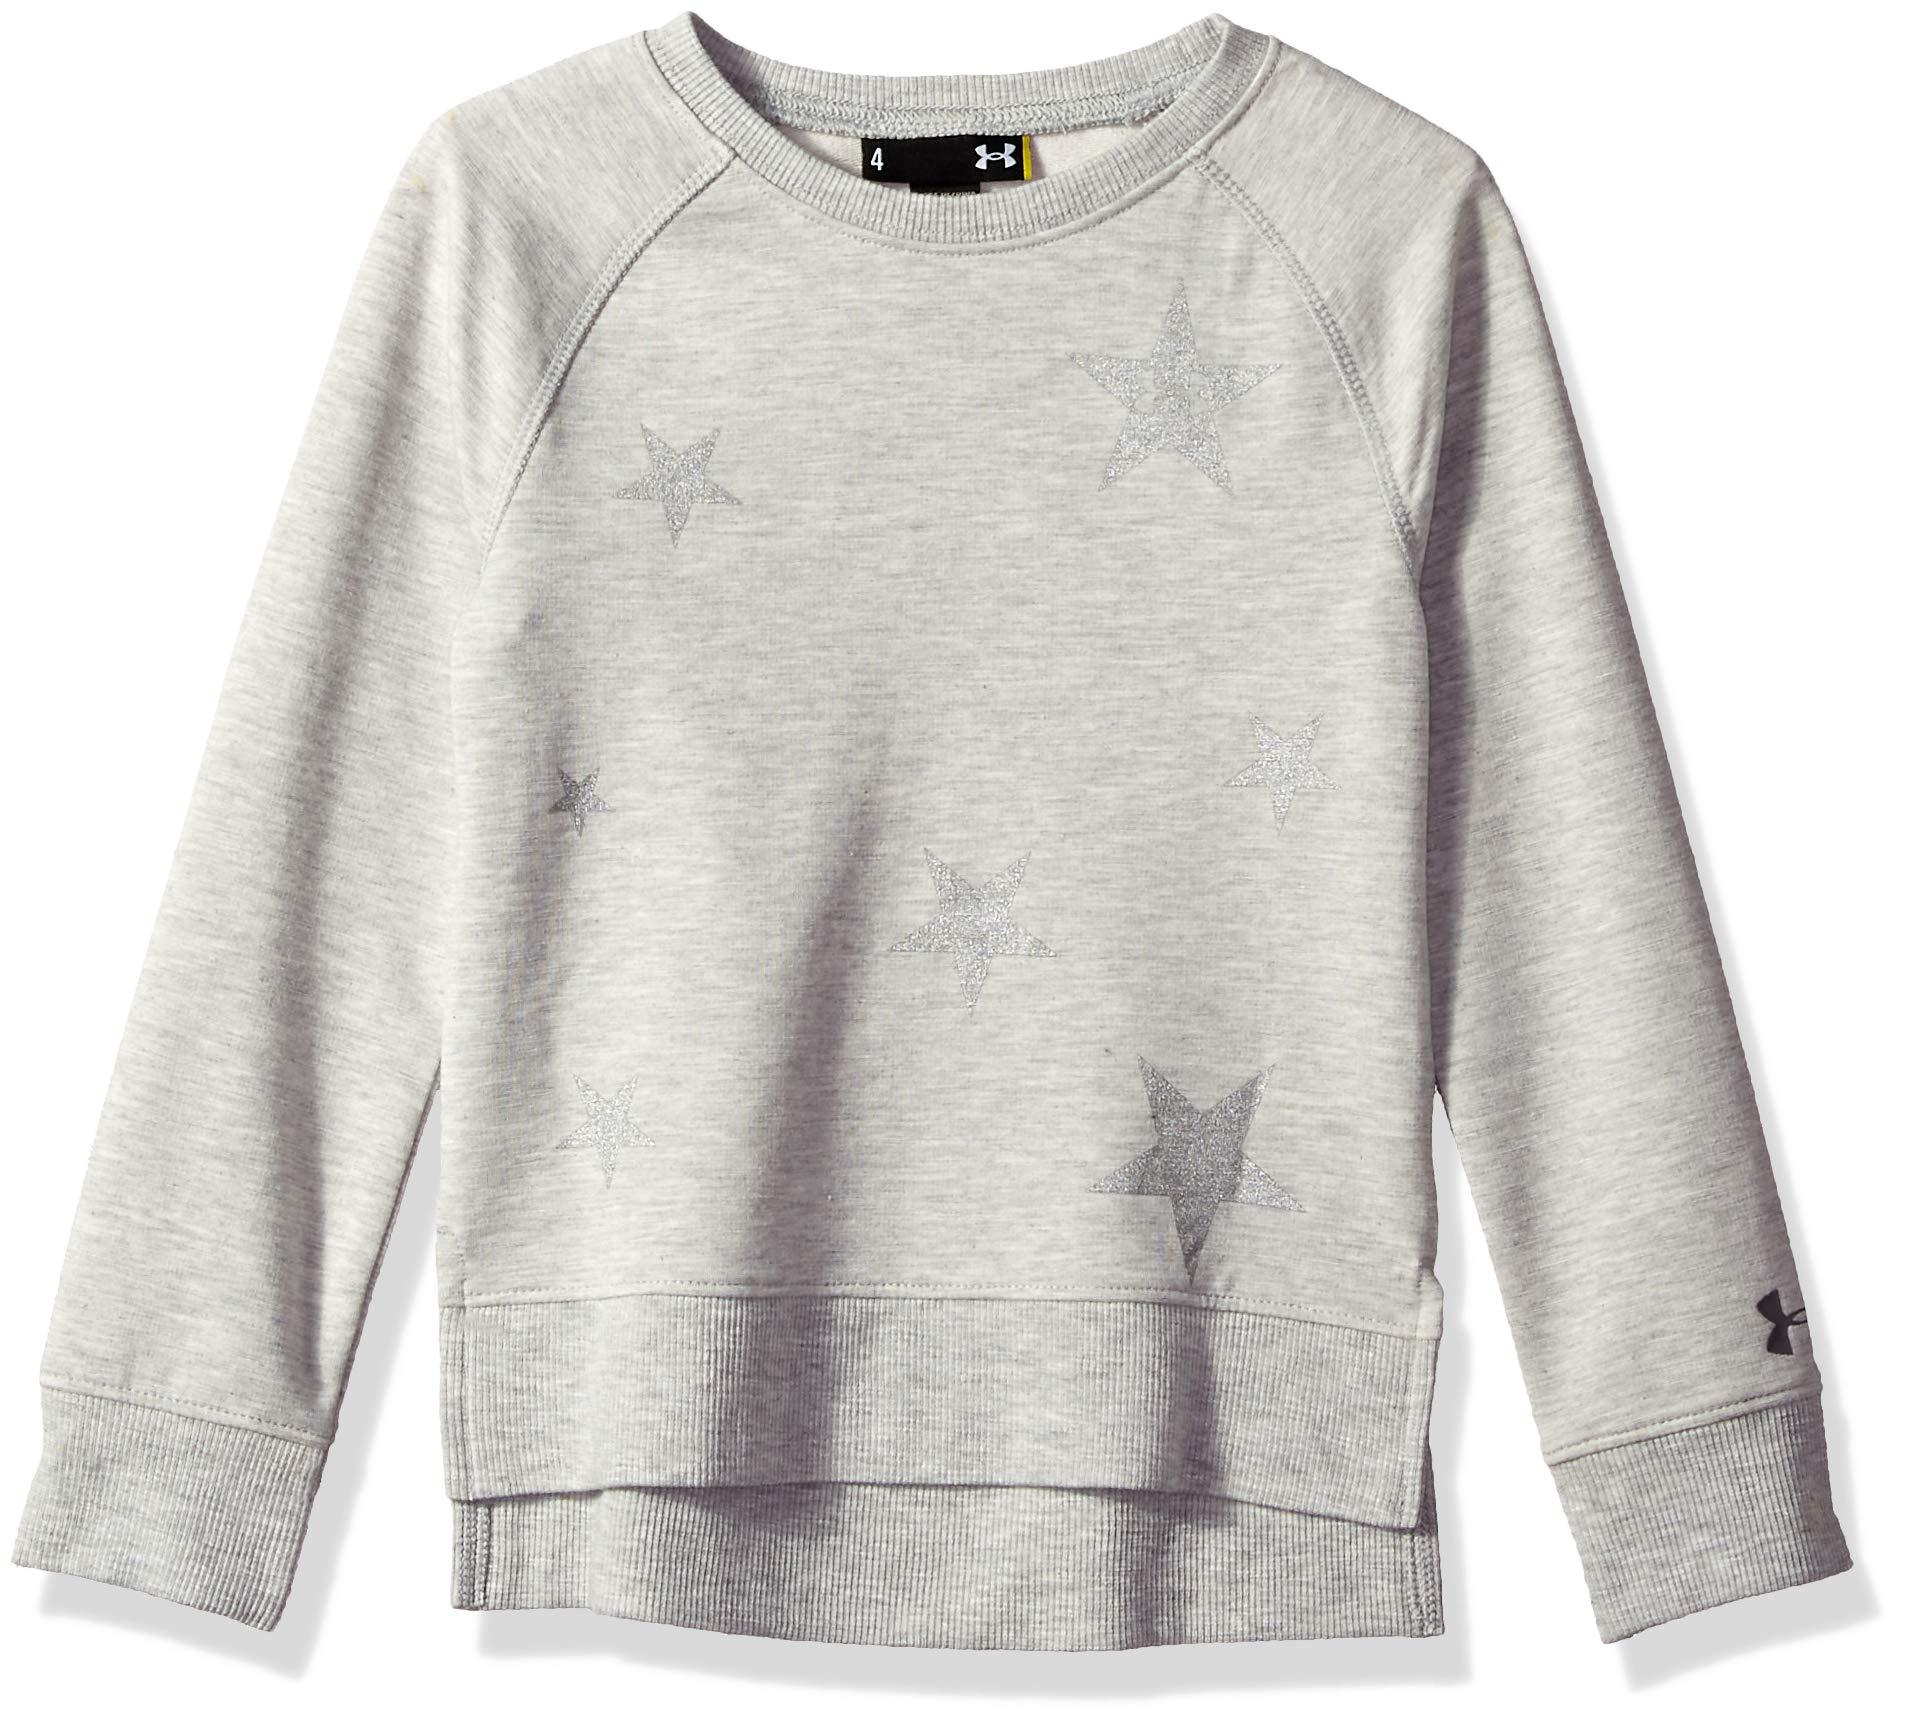 Under Armour Girls' Toddler Fashion Pullover Sweater, True Grey Heath, 2T by Under Armour